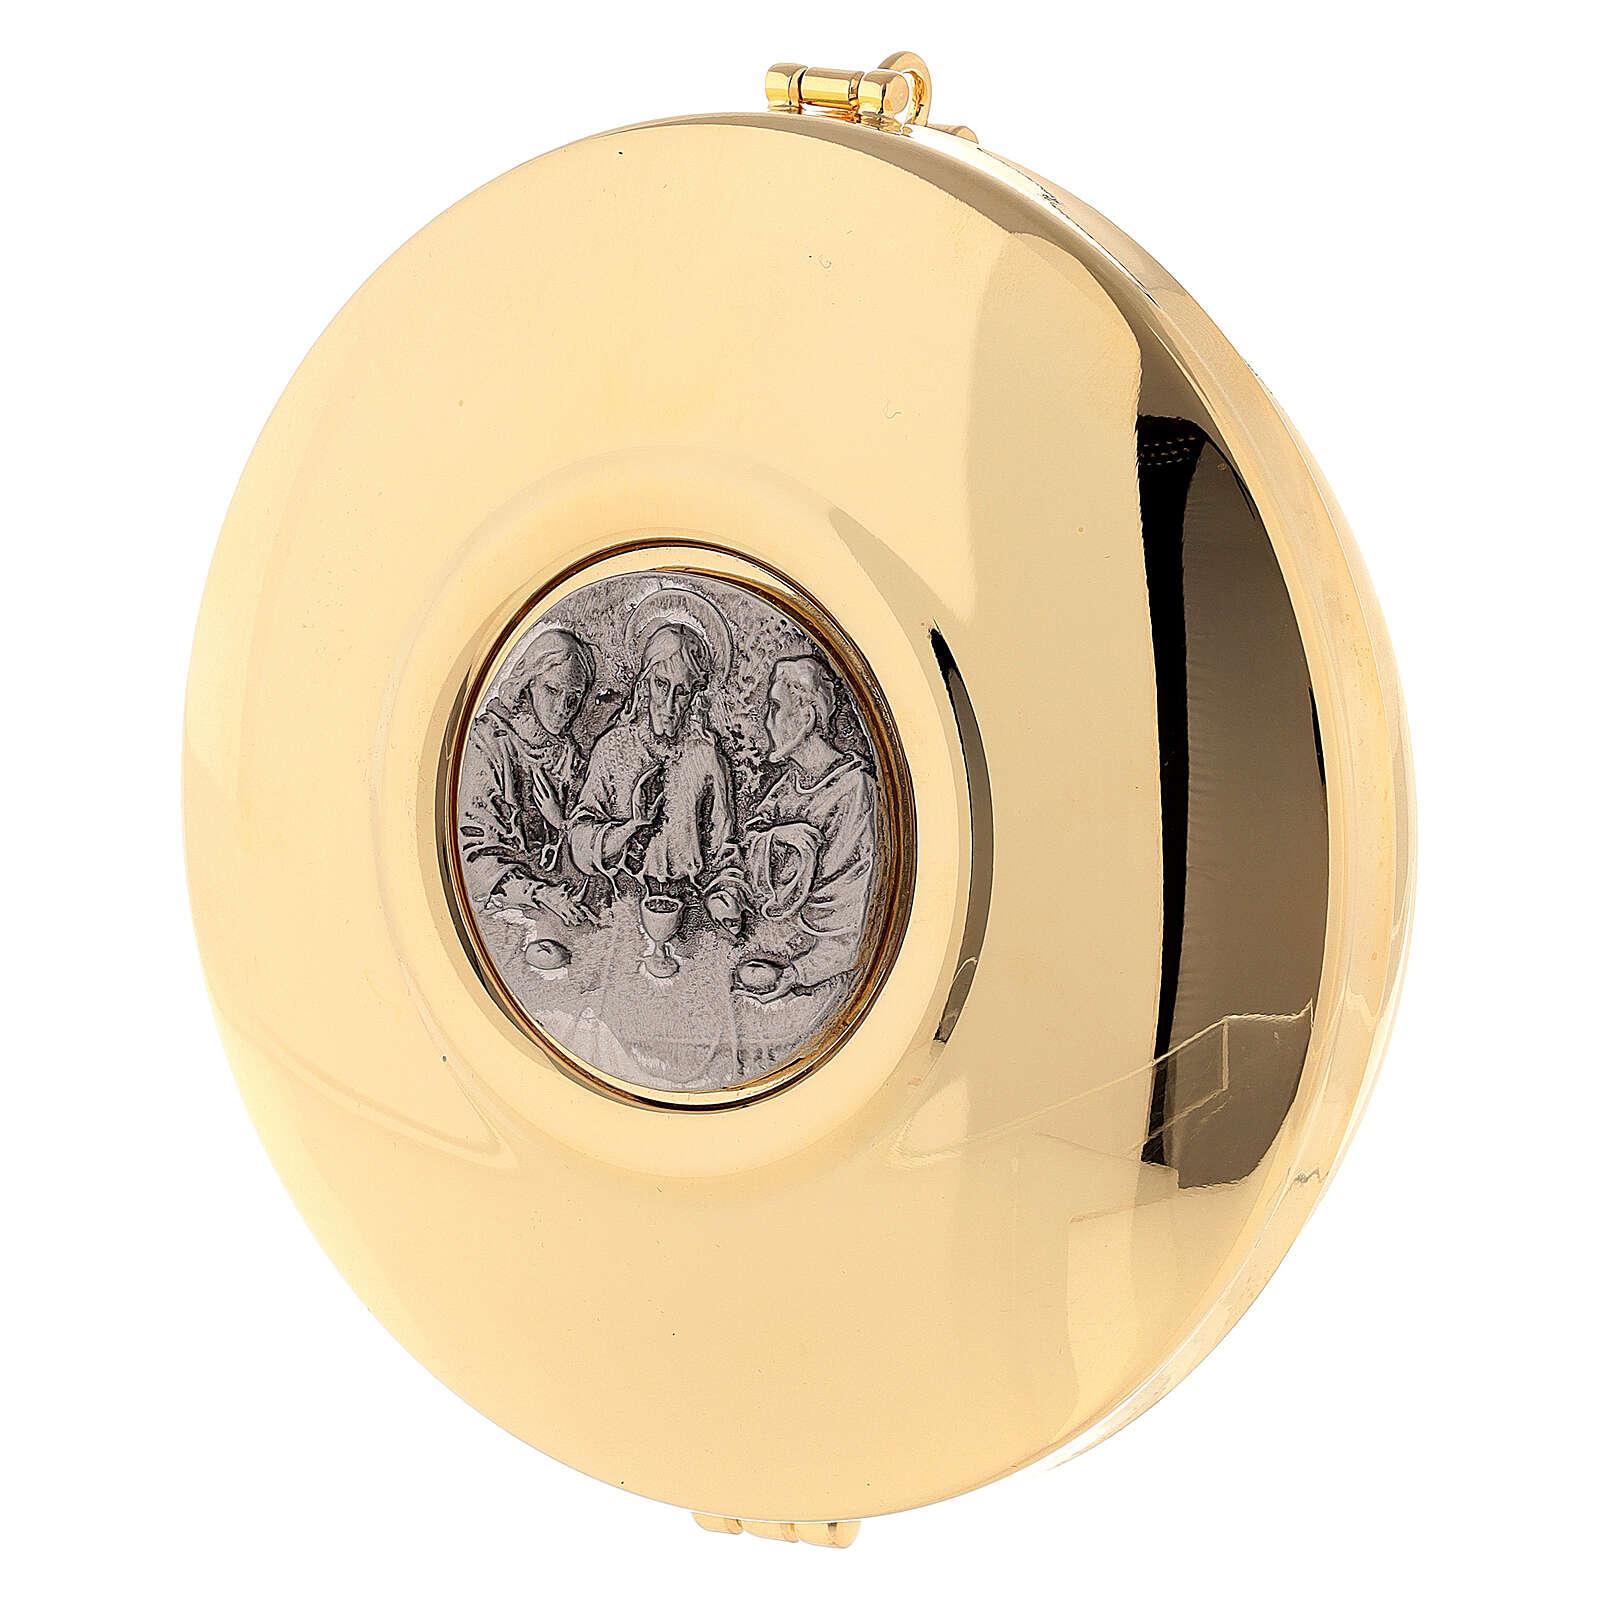 Portateca pelle tipo foca con teca dorata 12 cm 3